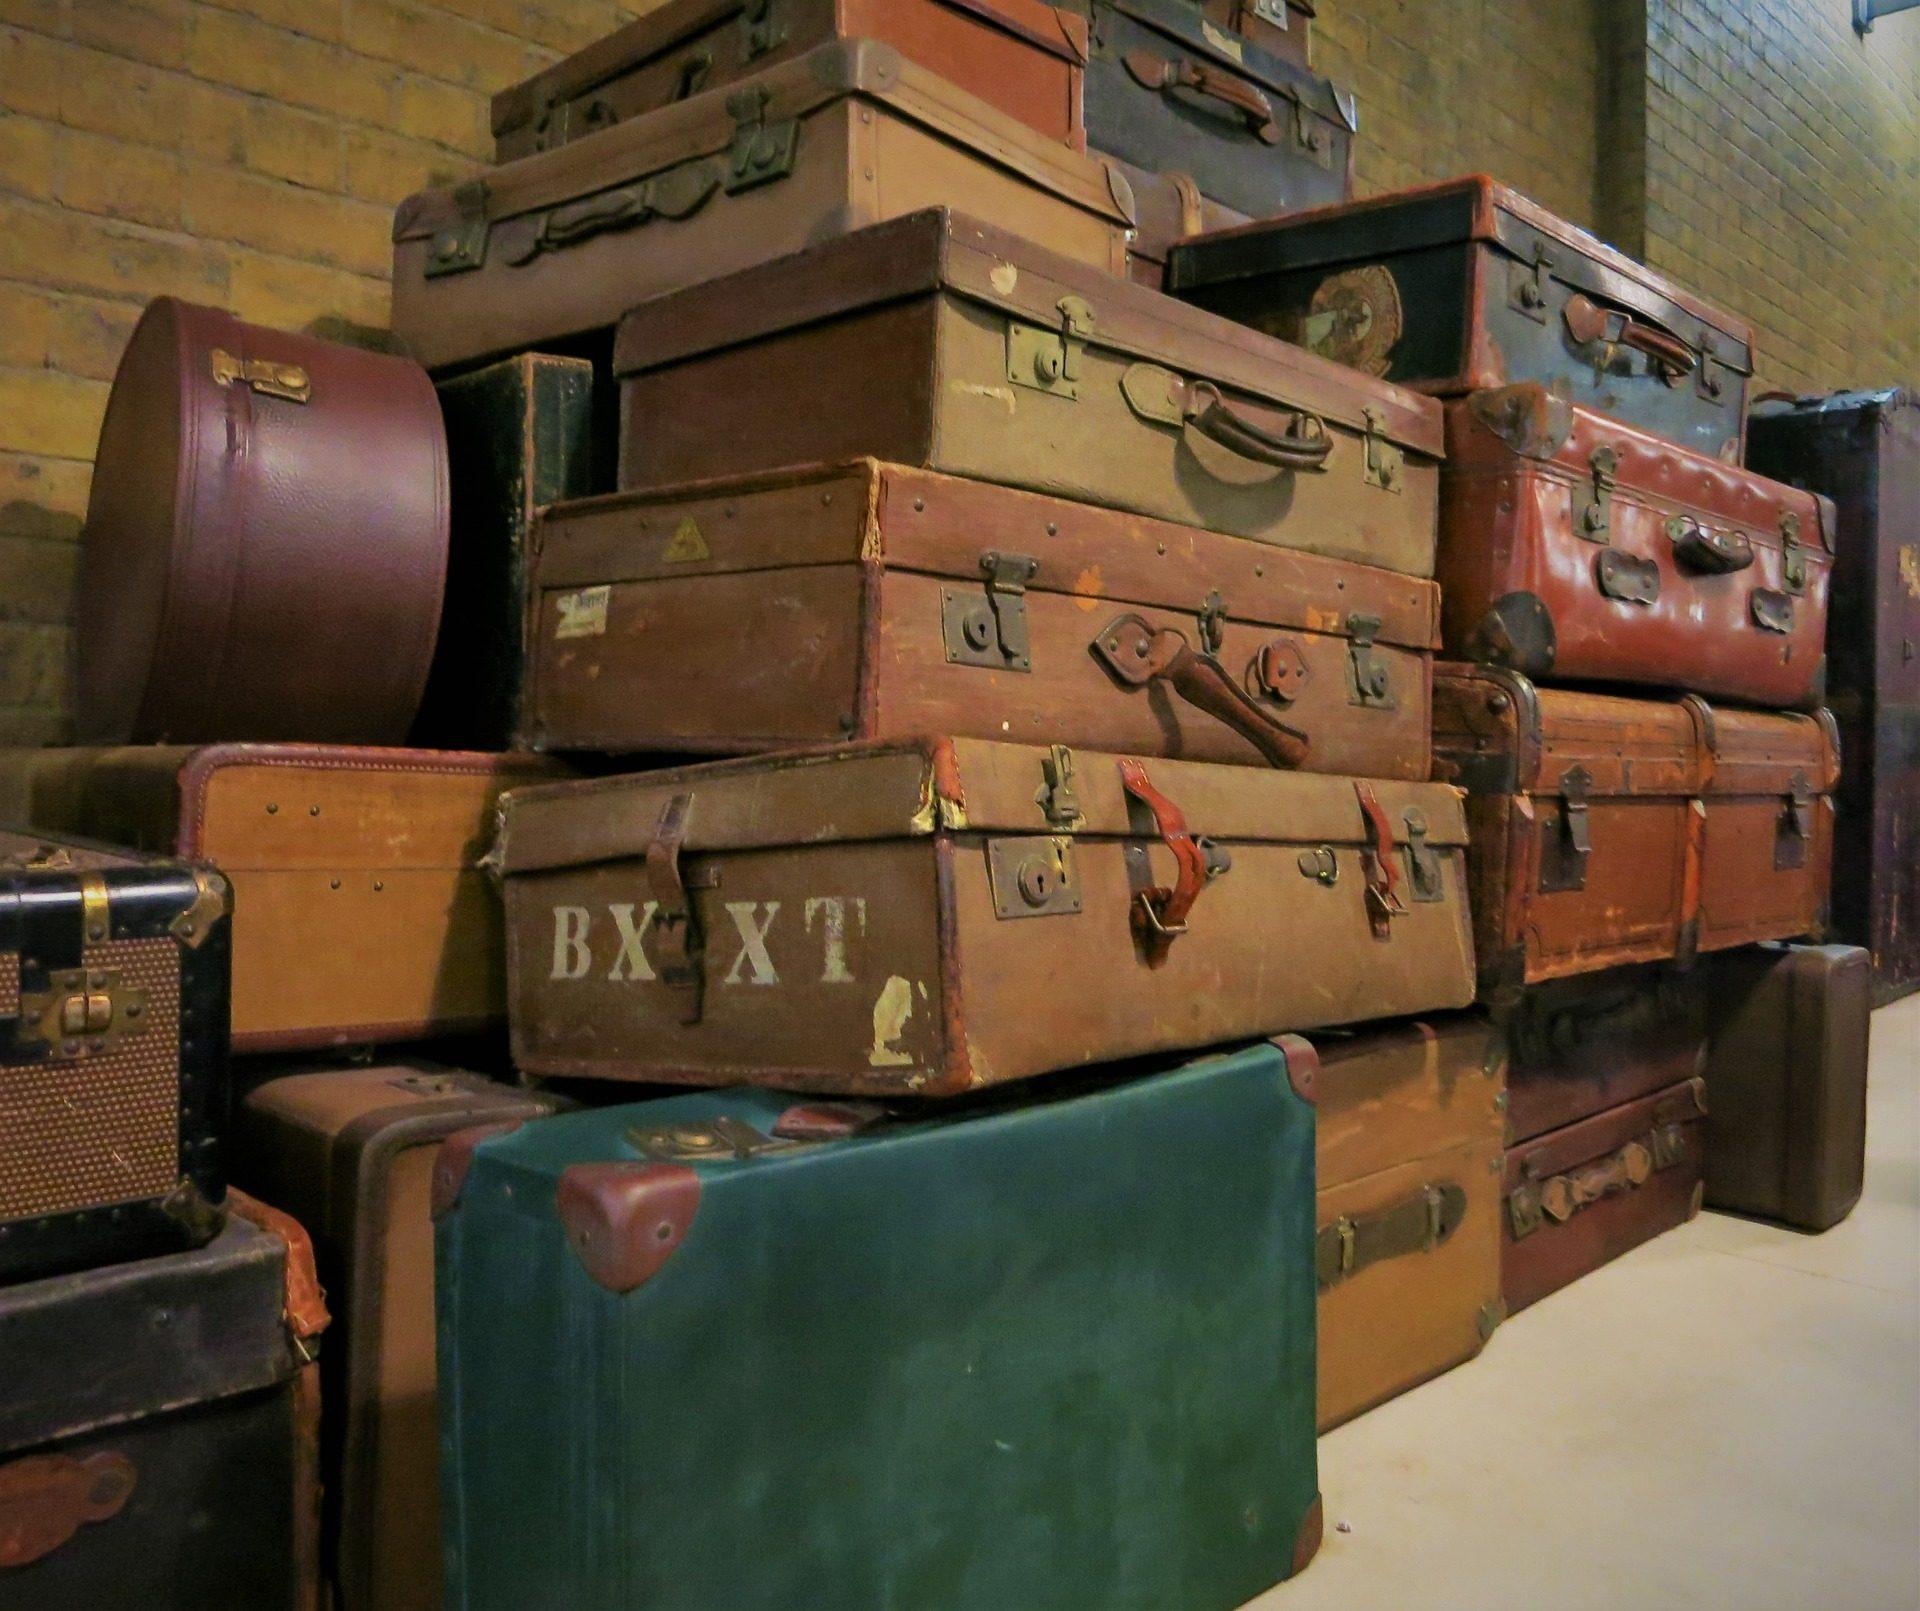 maletas, 行李, 老, 古代, 年份 - 高清壁纸 - 教授-falken.com